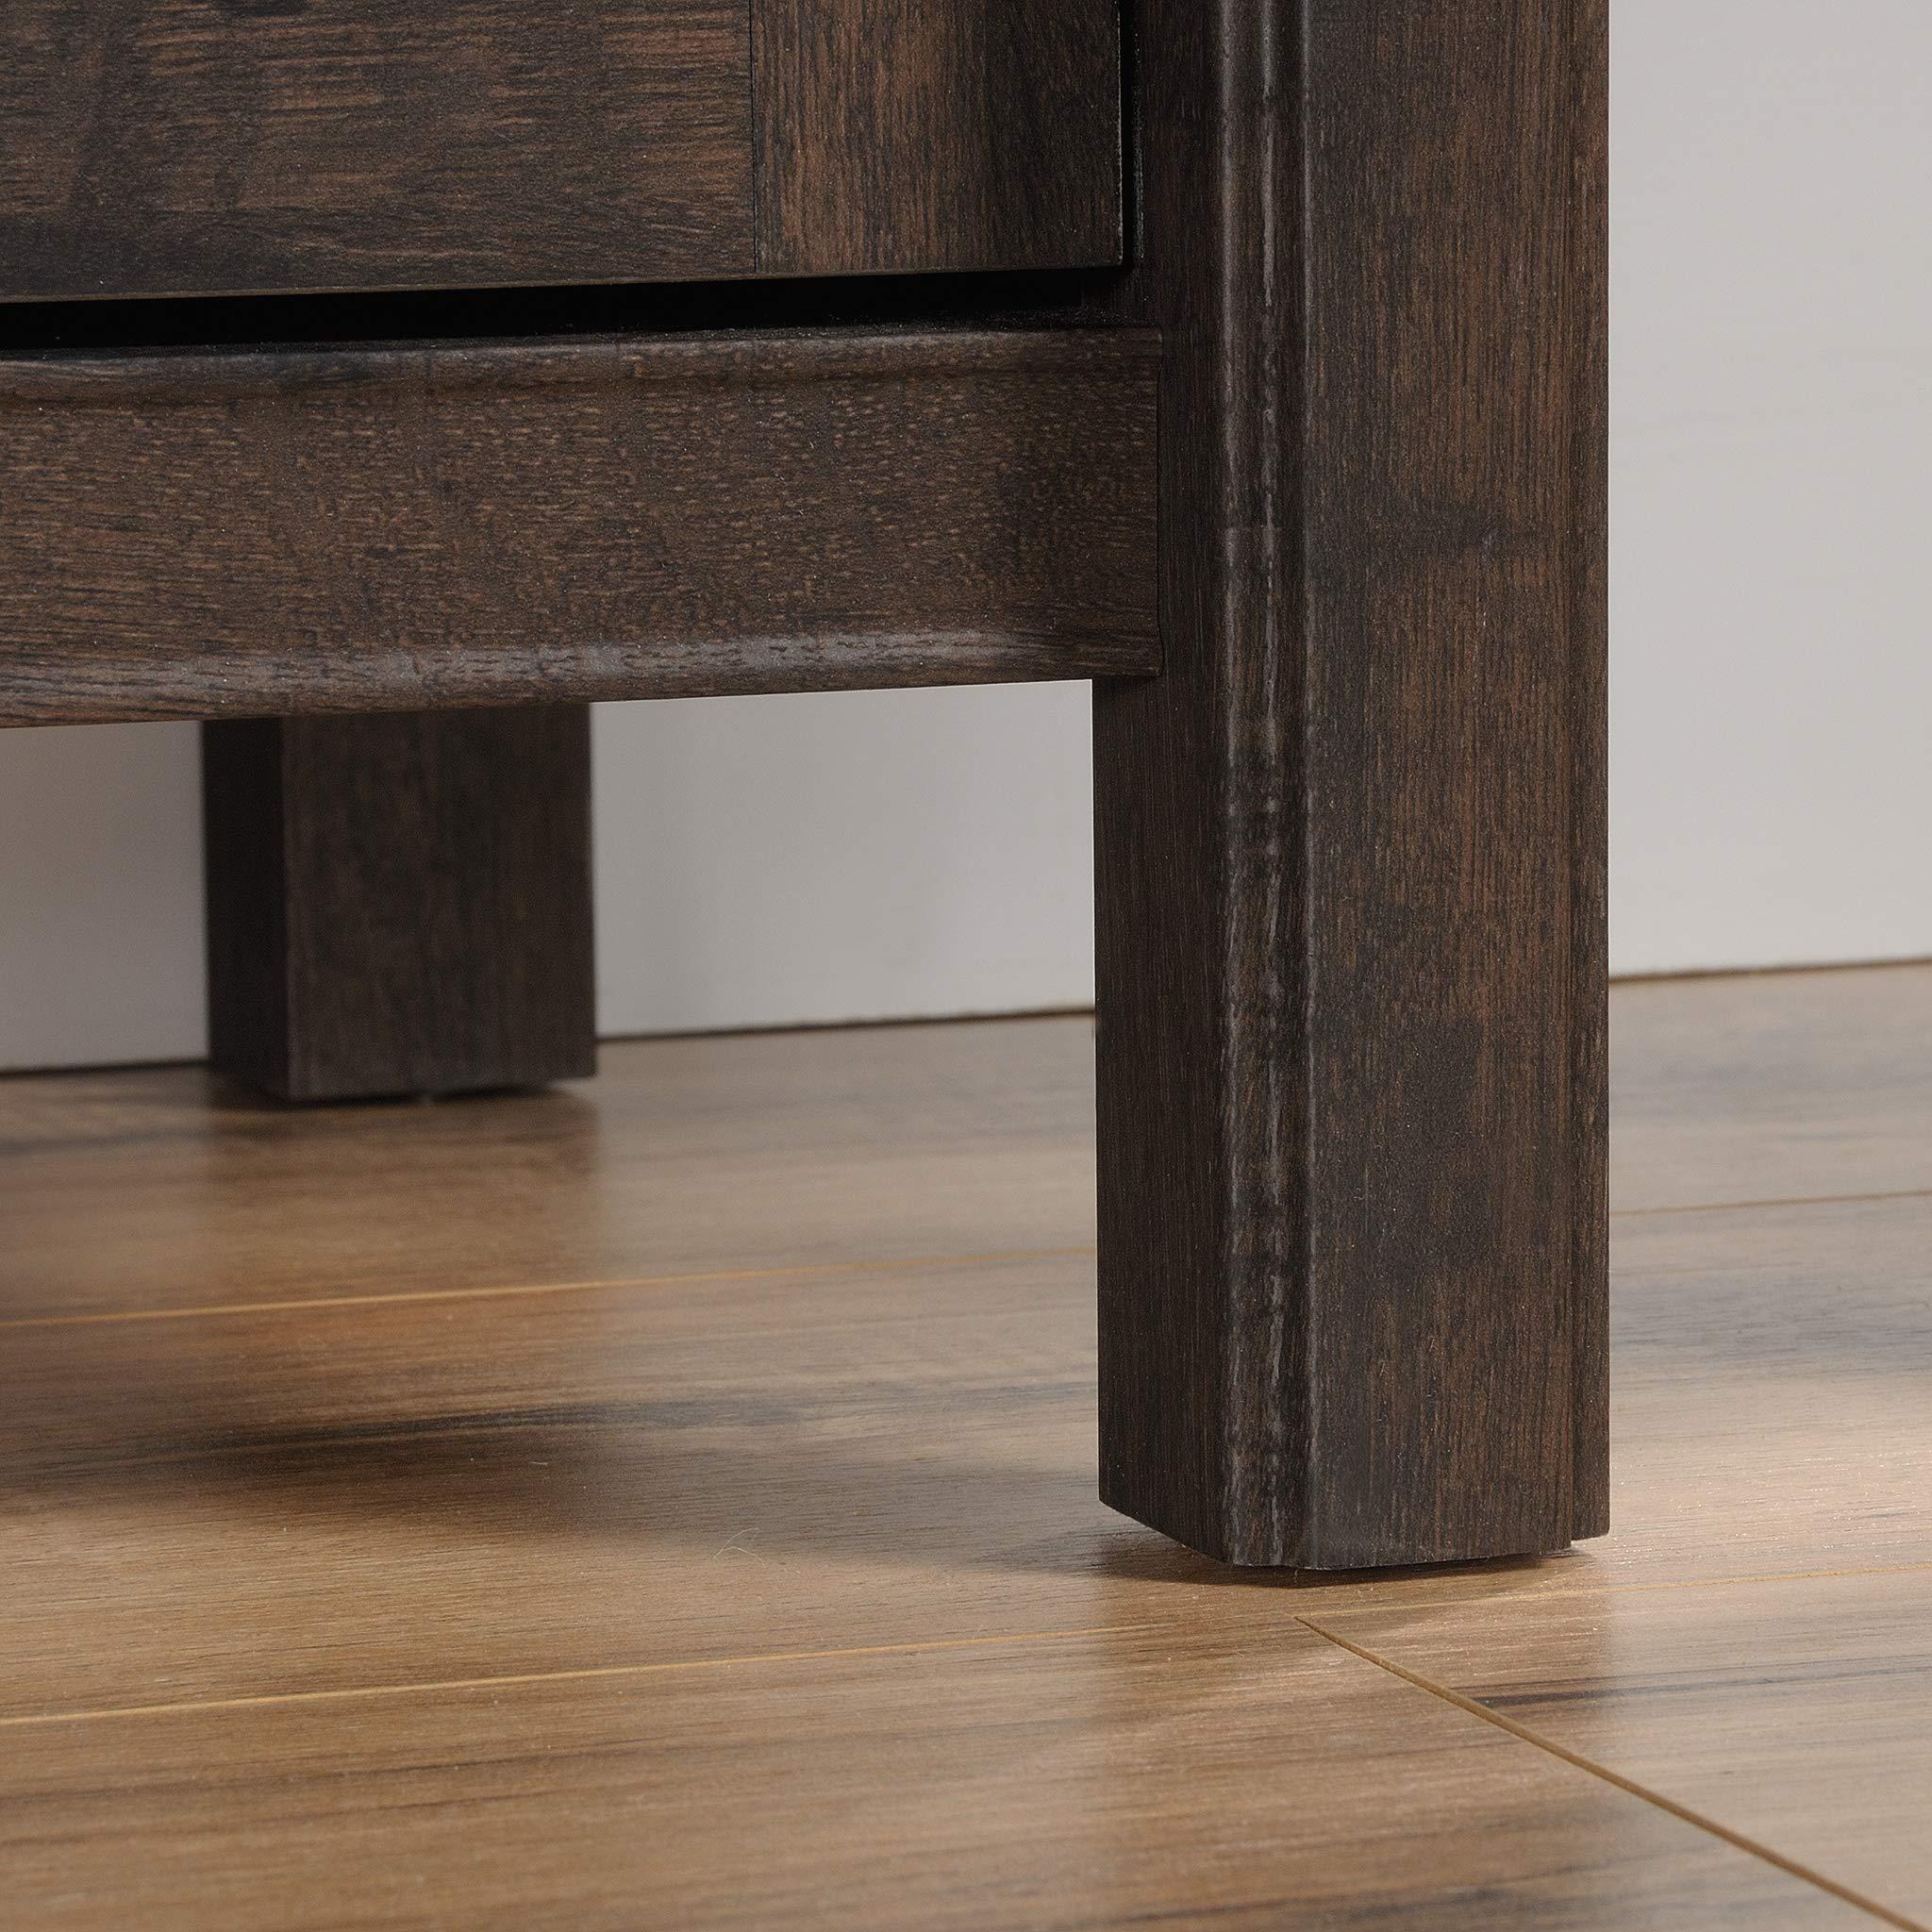 Sauder 422981 Costa Library Base, L: 31.30'' x W: 14.41'' x H: 30.00'', Coffee Oak Finish by Sauder (Image #6)